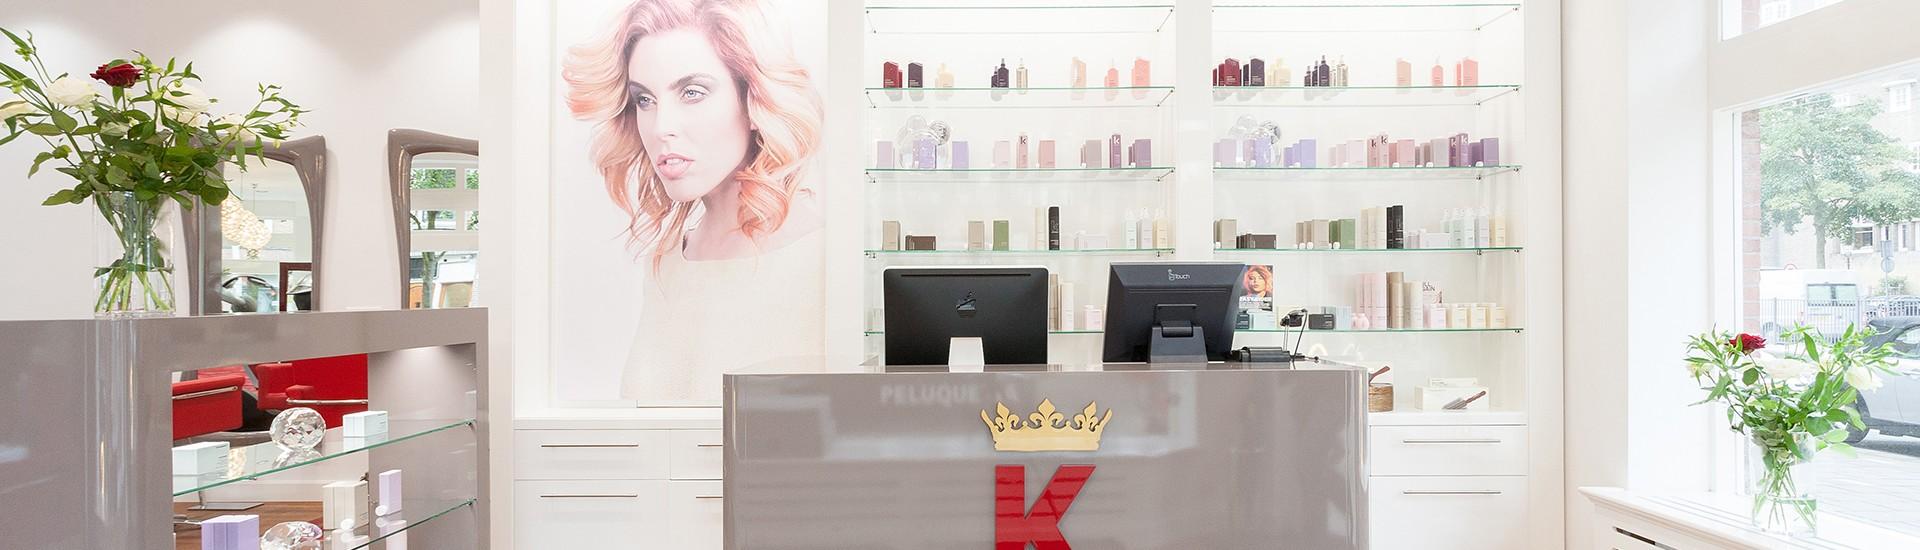 Kbal-hairstylist-Kapsalon-Amsterdam01